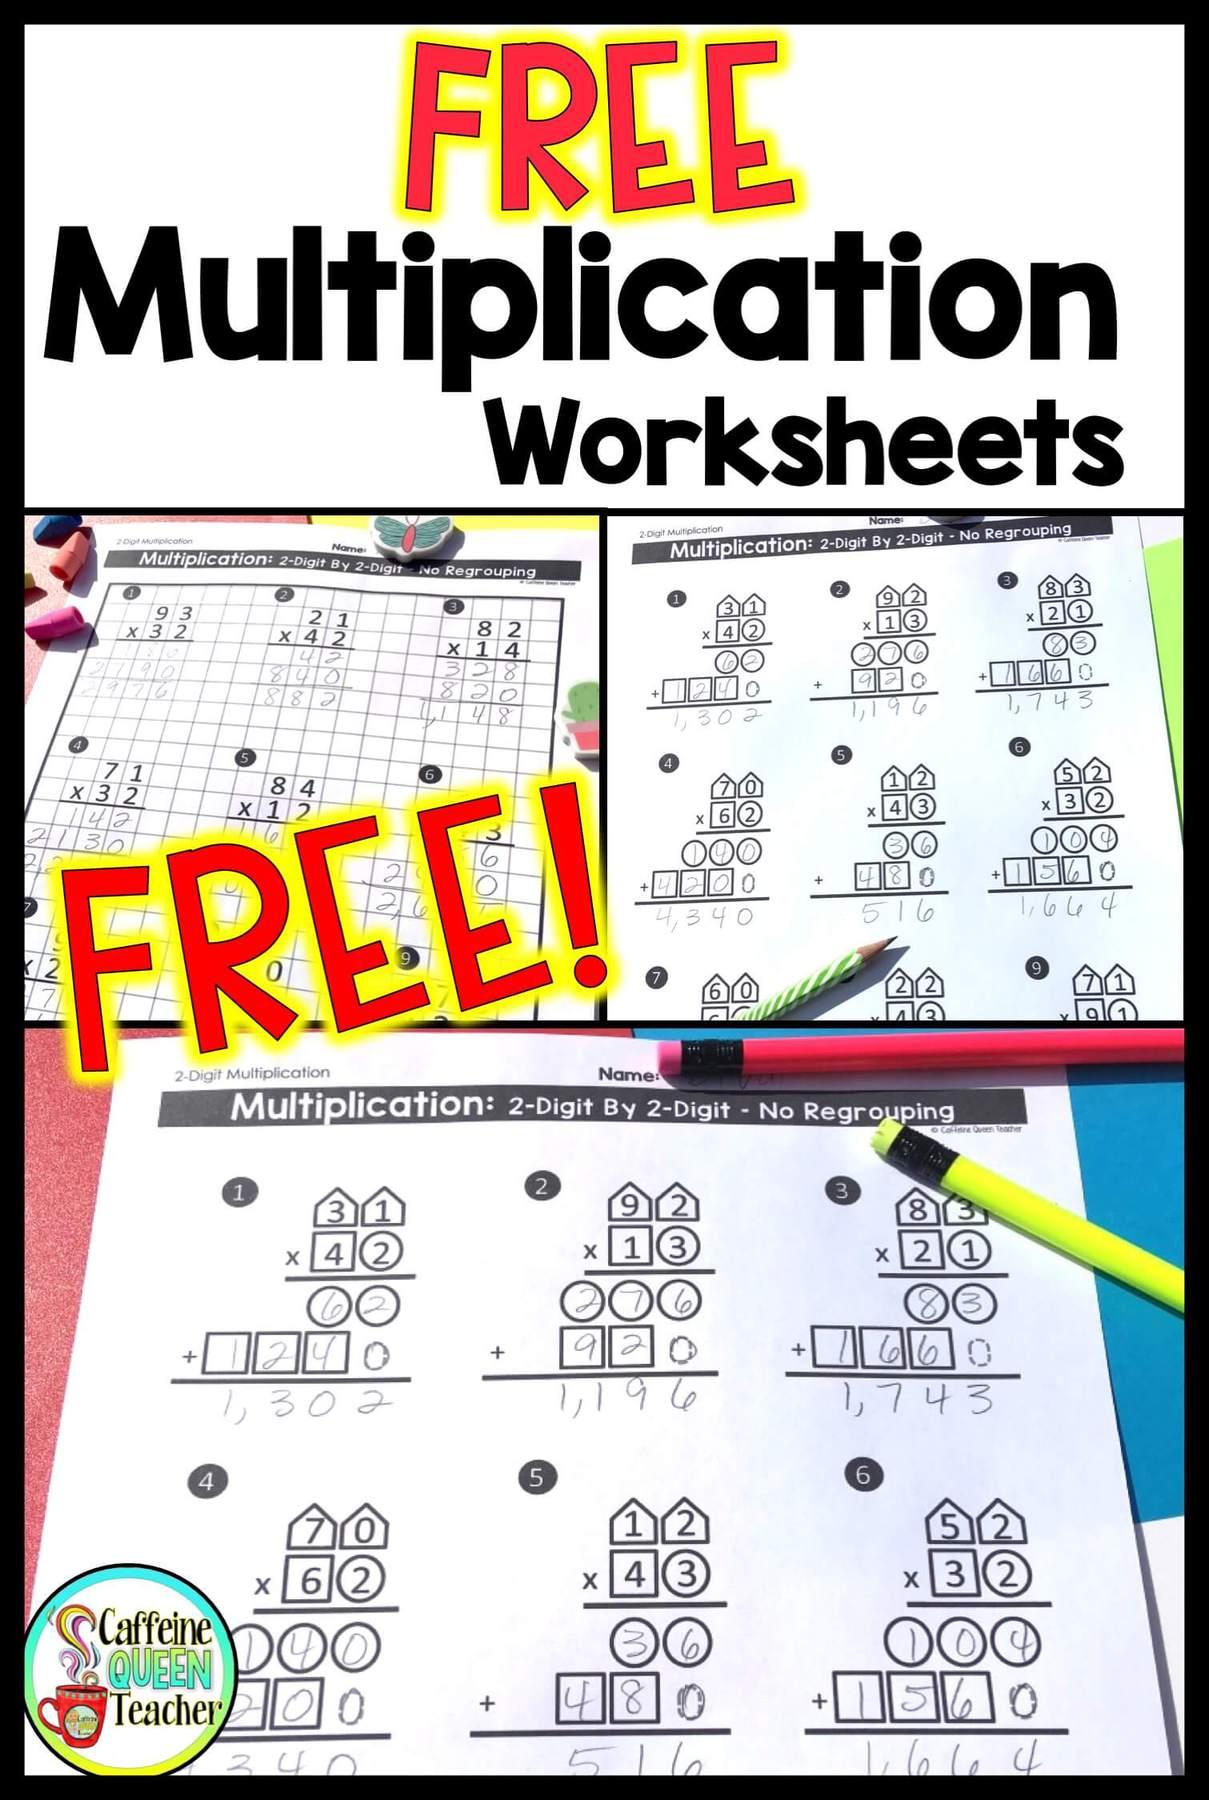 medium resolution of 2-Digit Multiplication Worksheets: Differentiated - Caffeine Queen Teacher